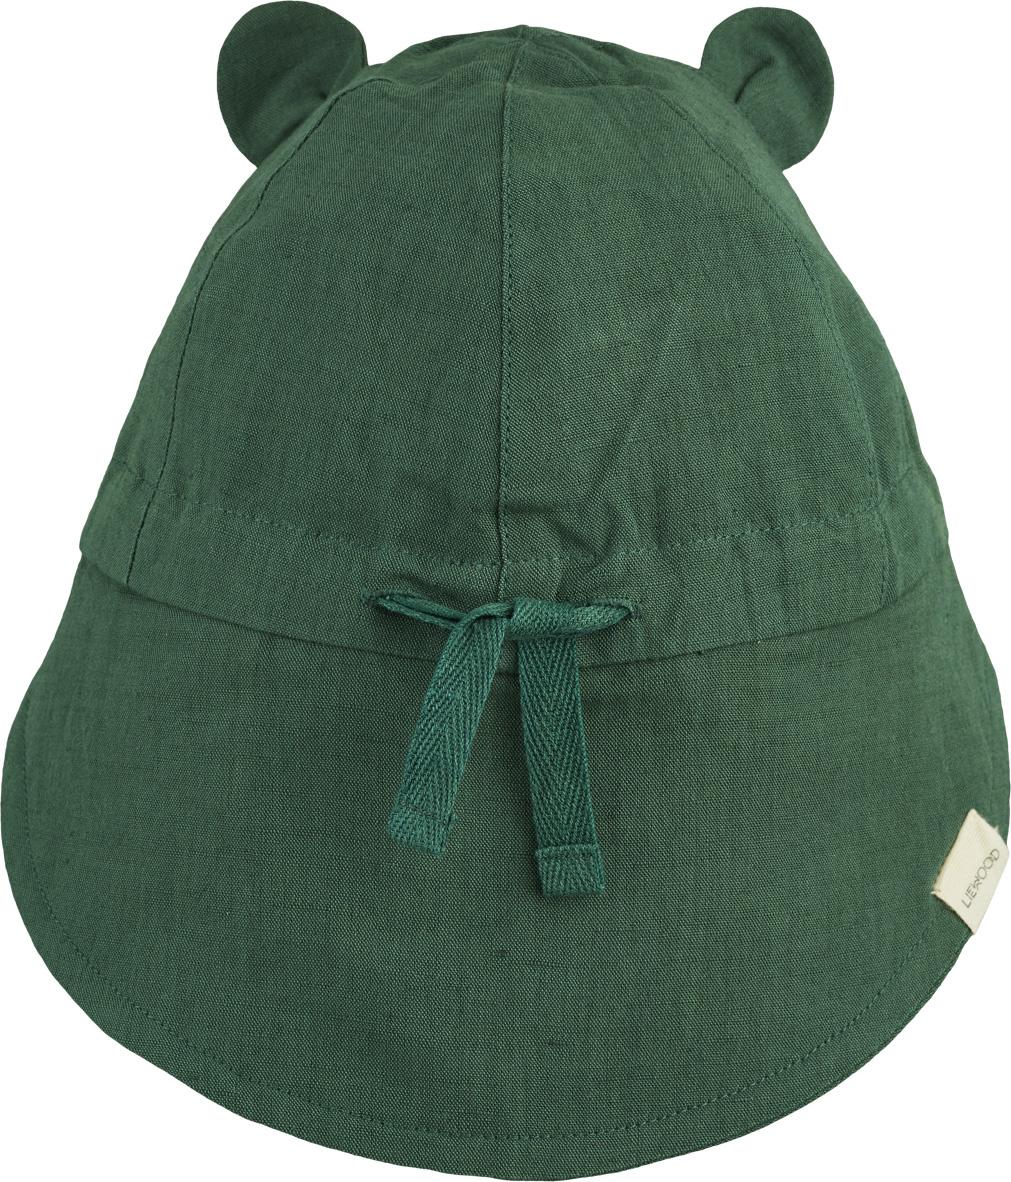 Eric sun hat - Garden green-2